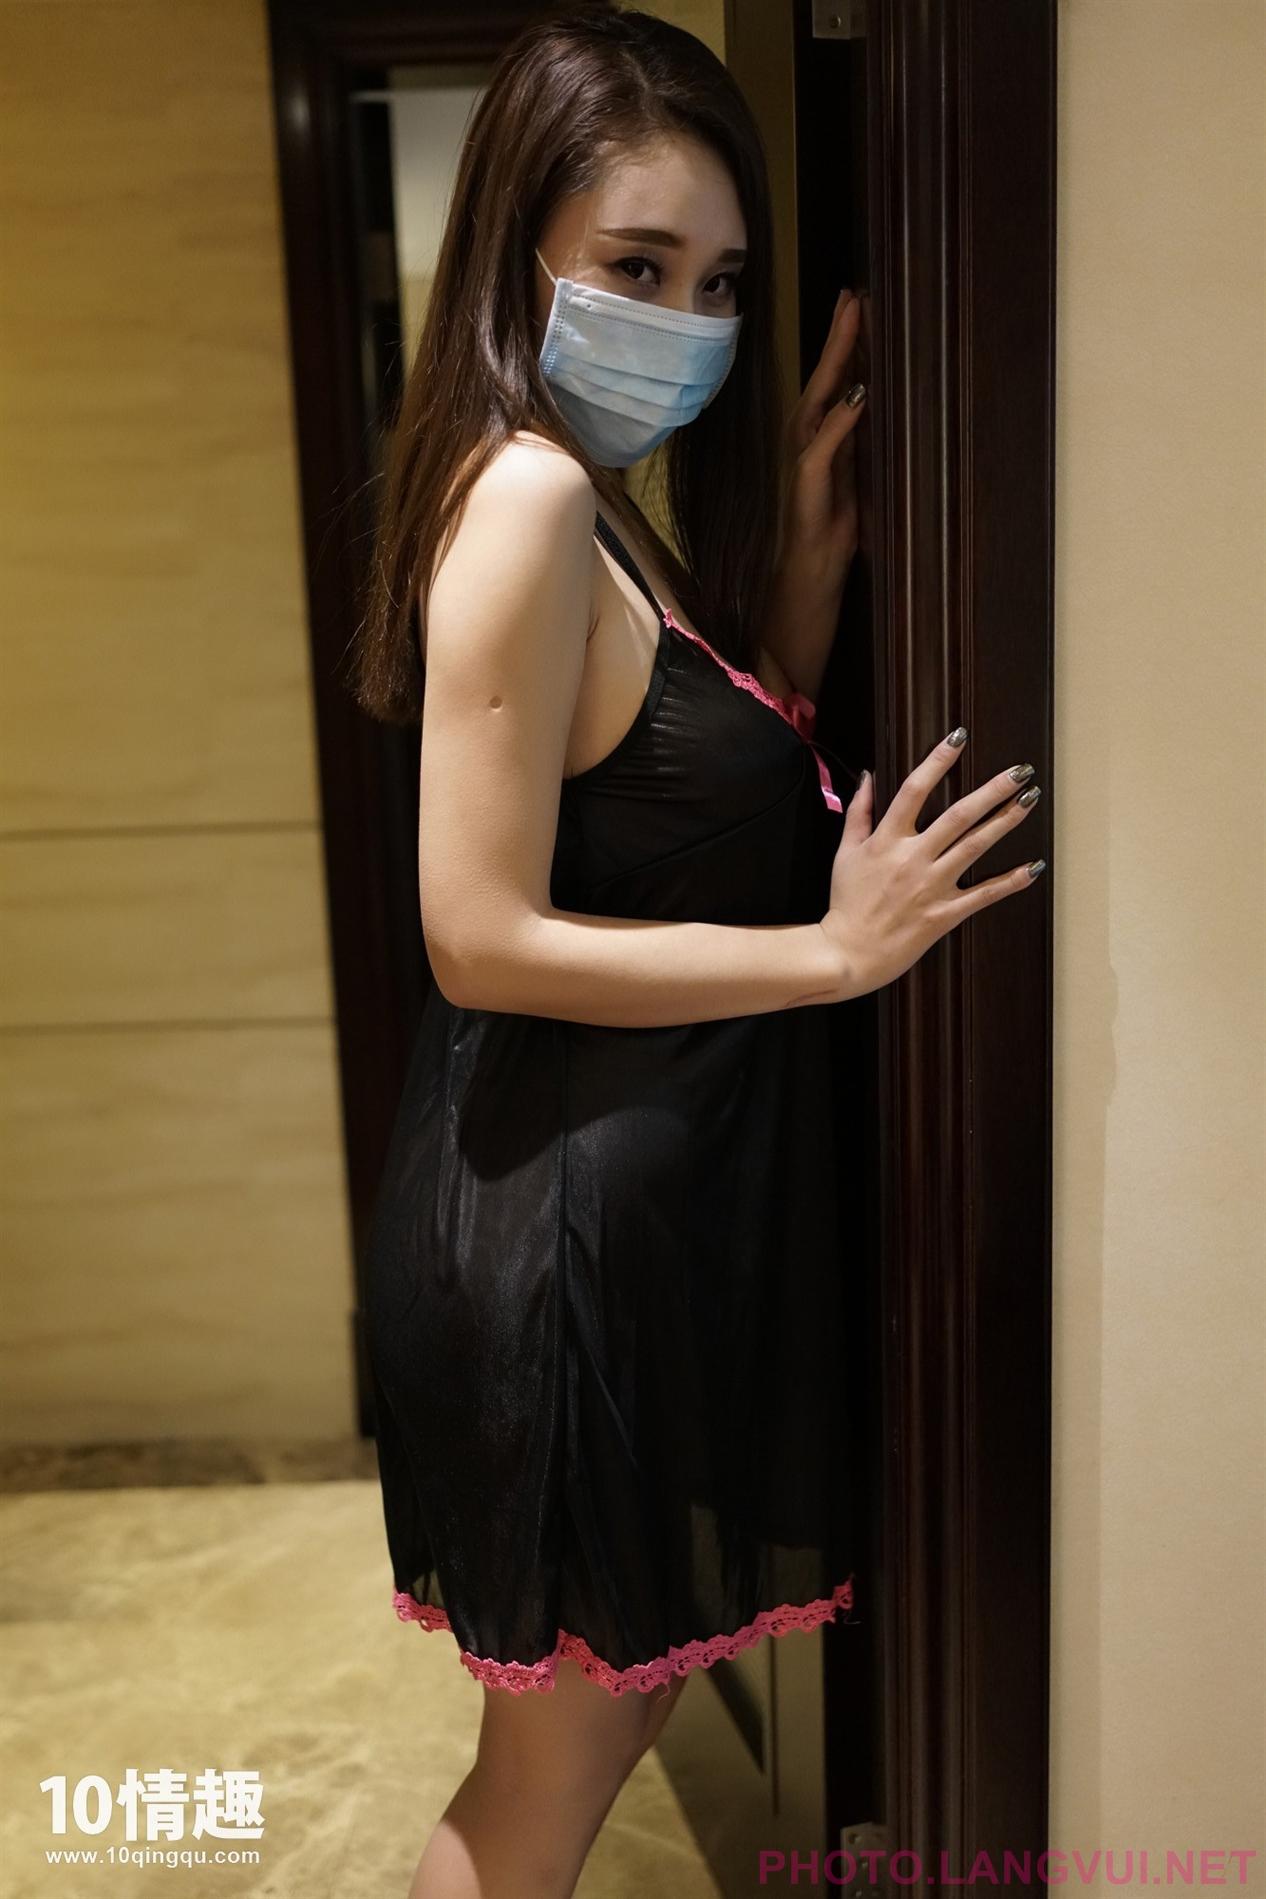 10QingQu Mask Series No 223